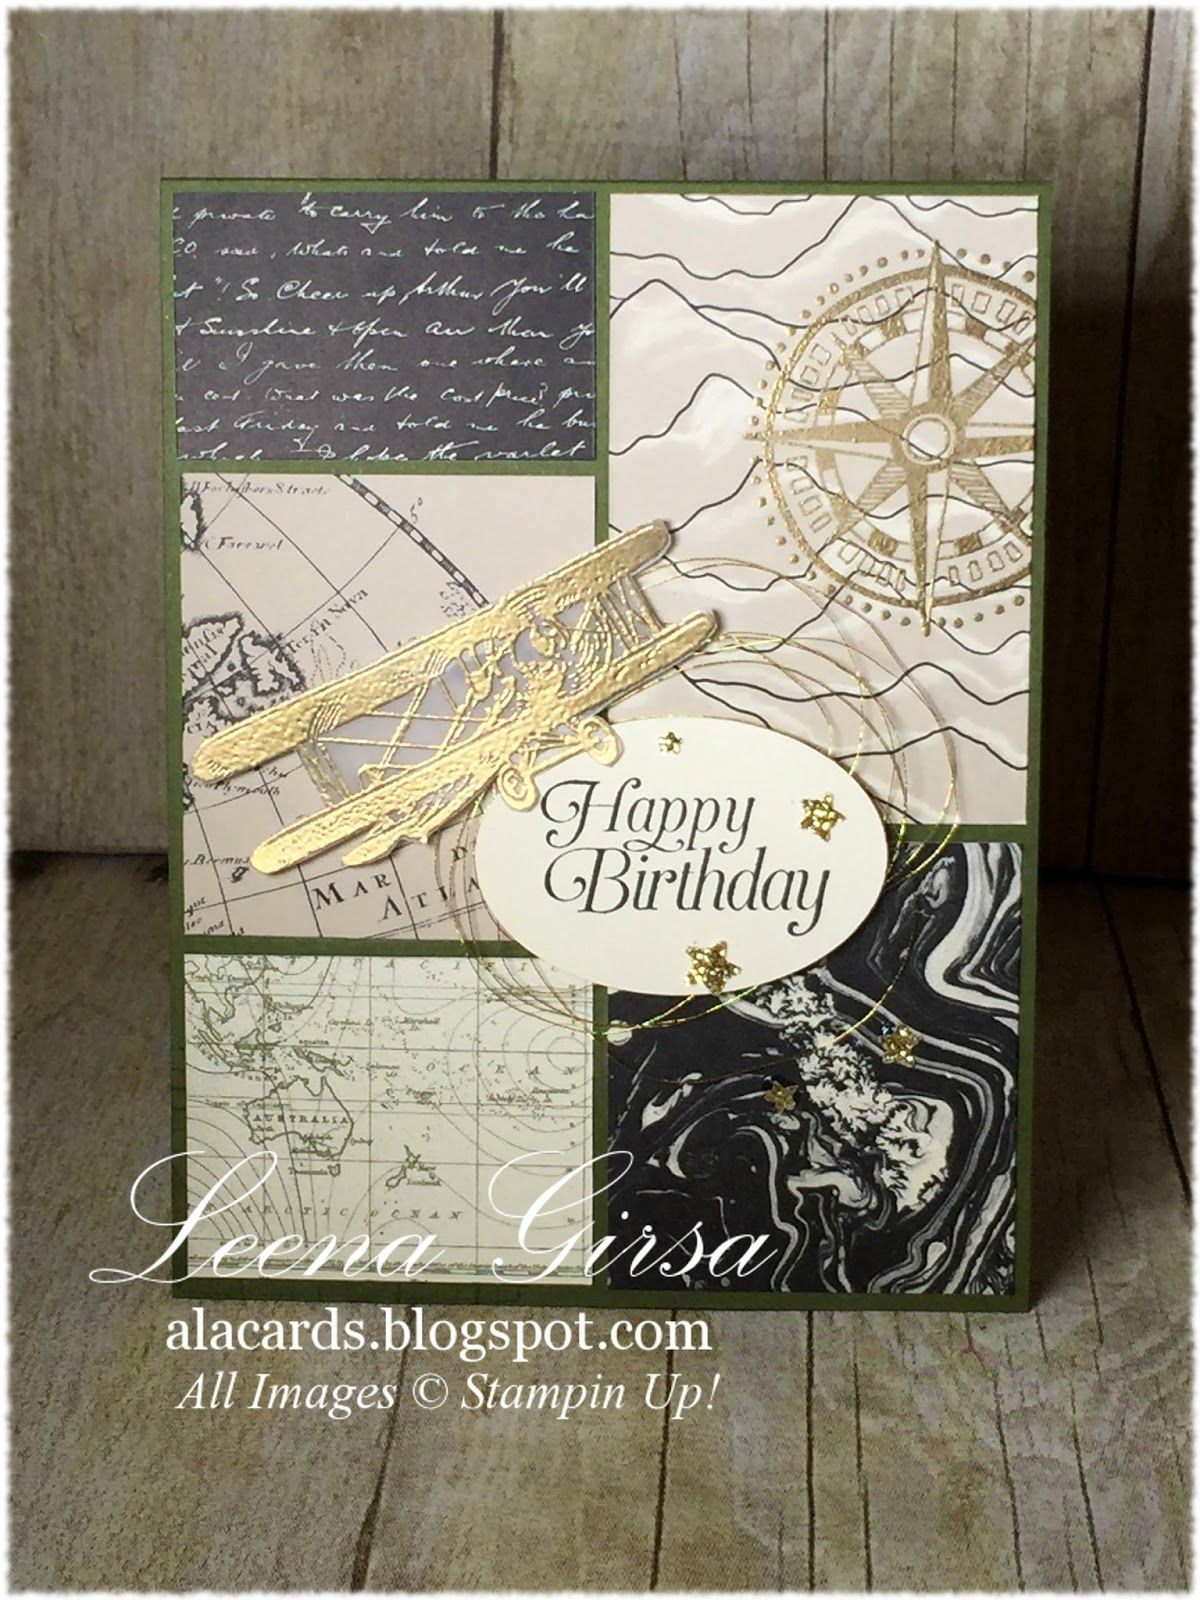 A La Cards Manly Birthday Su Masculine Birthday Card Featuring